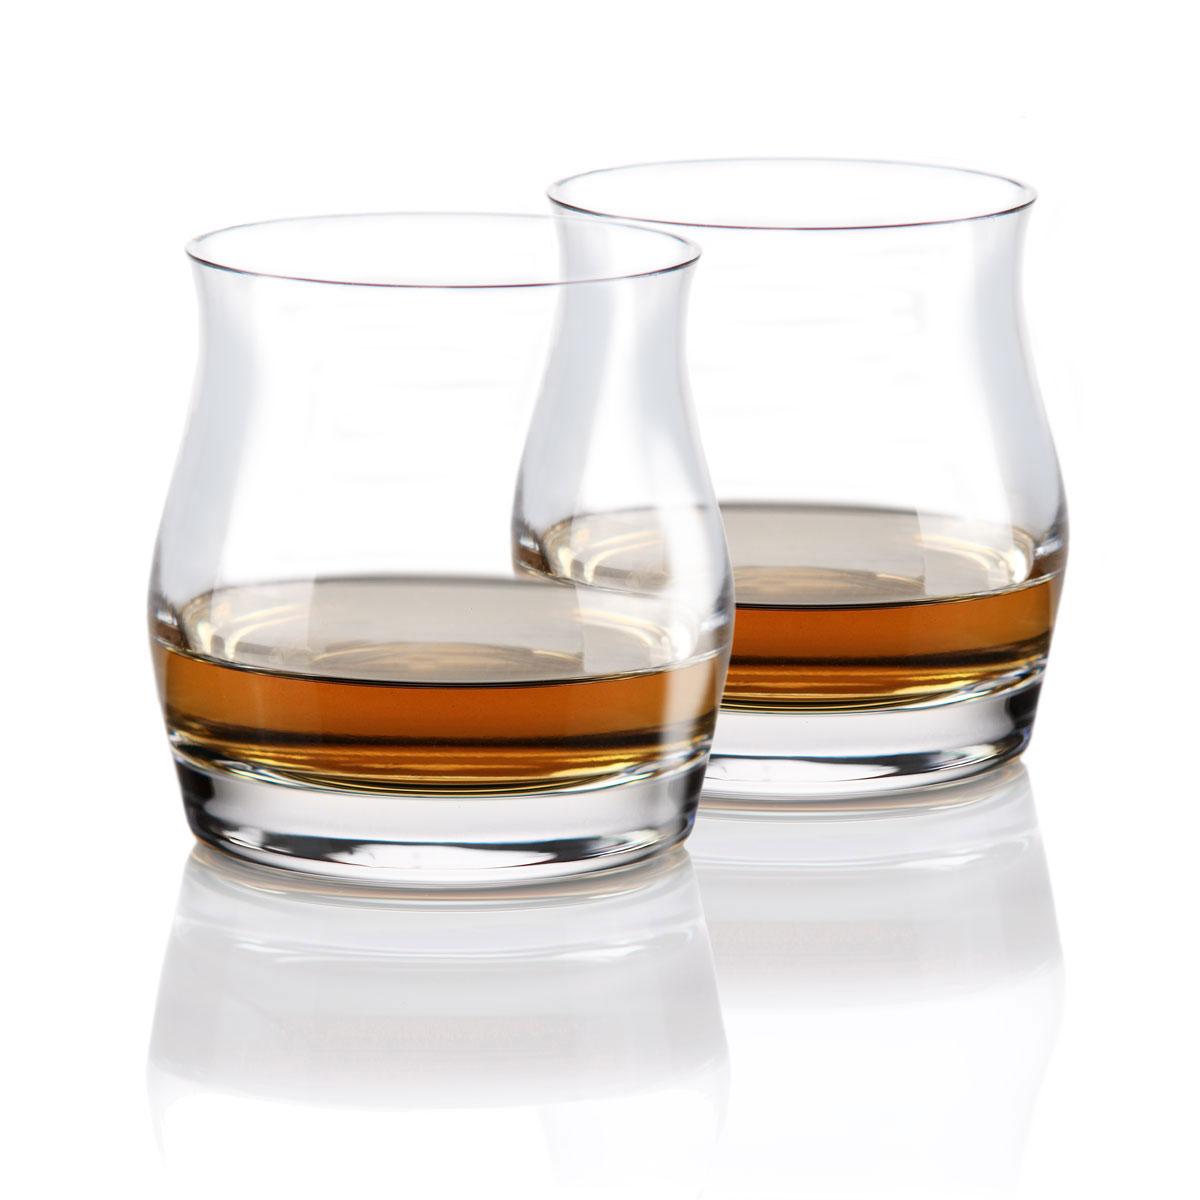 Cashs Ireland, Grand Cru Handmade Highland Single Malt Whiskey Glasses, Pair